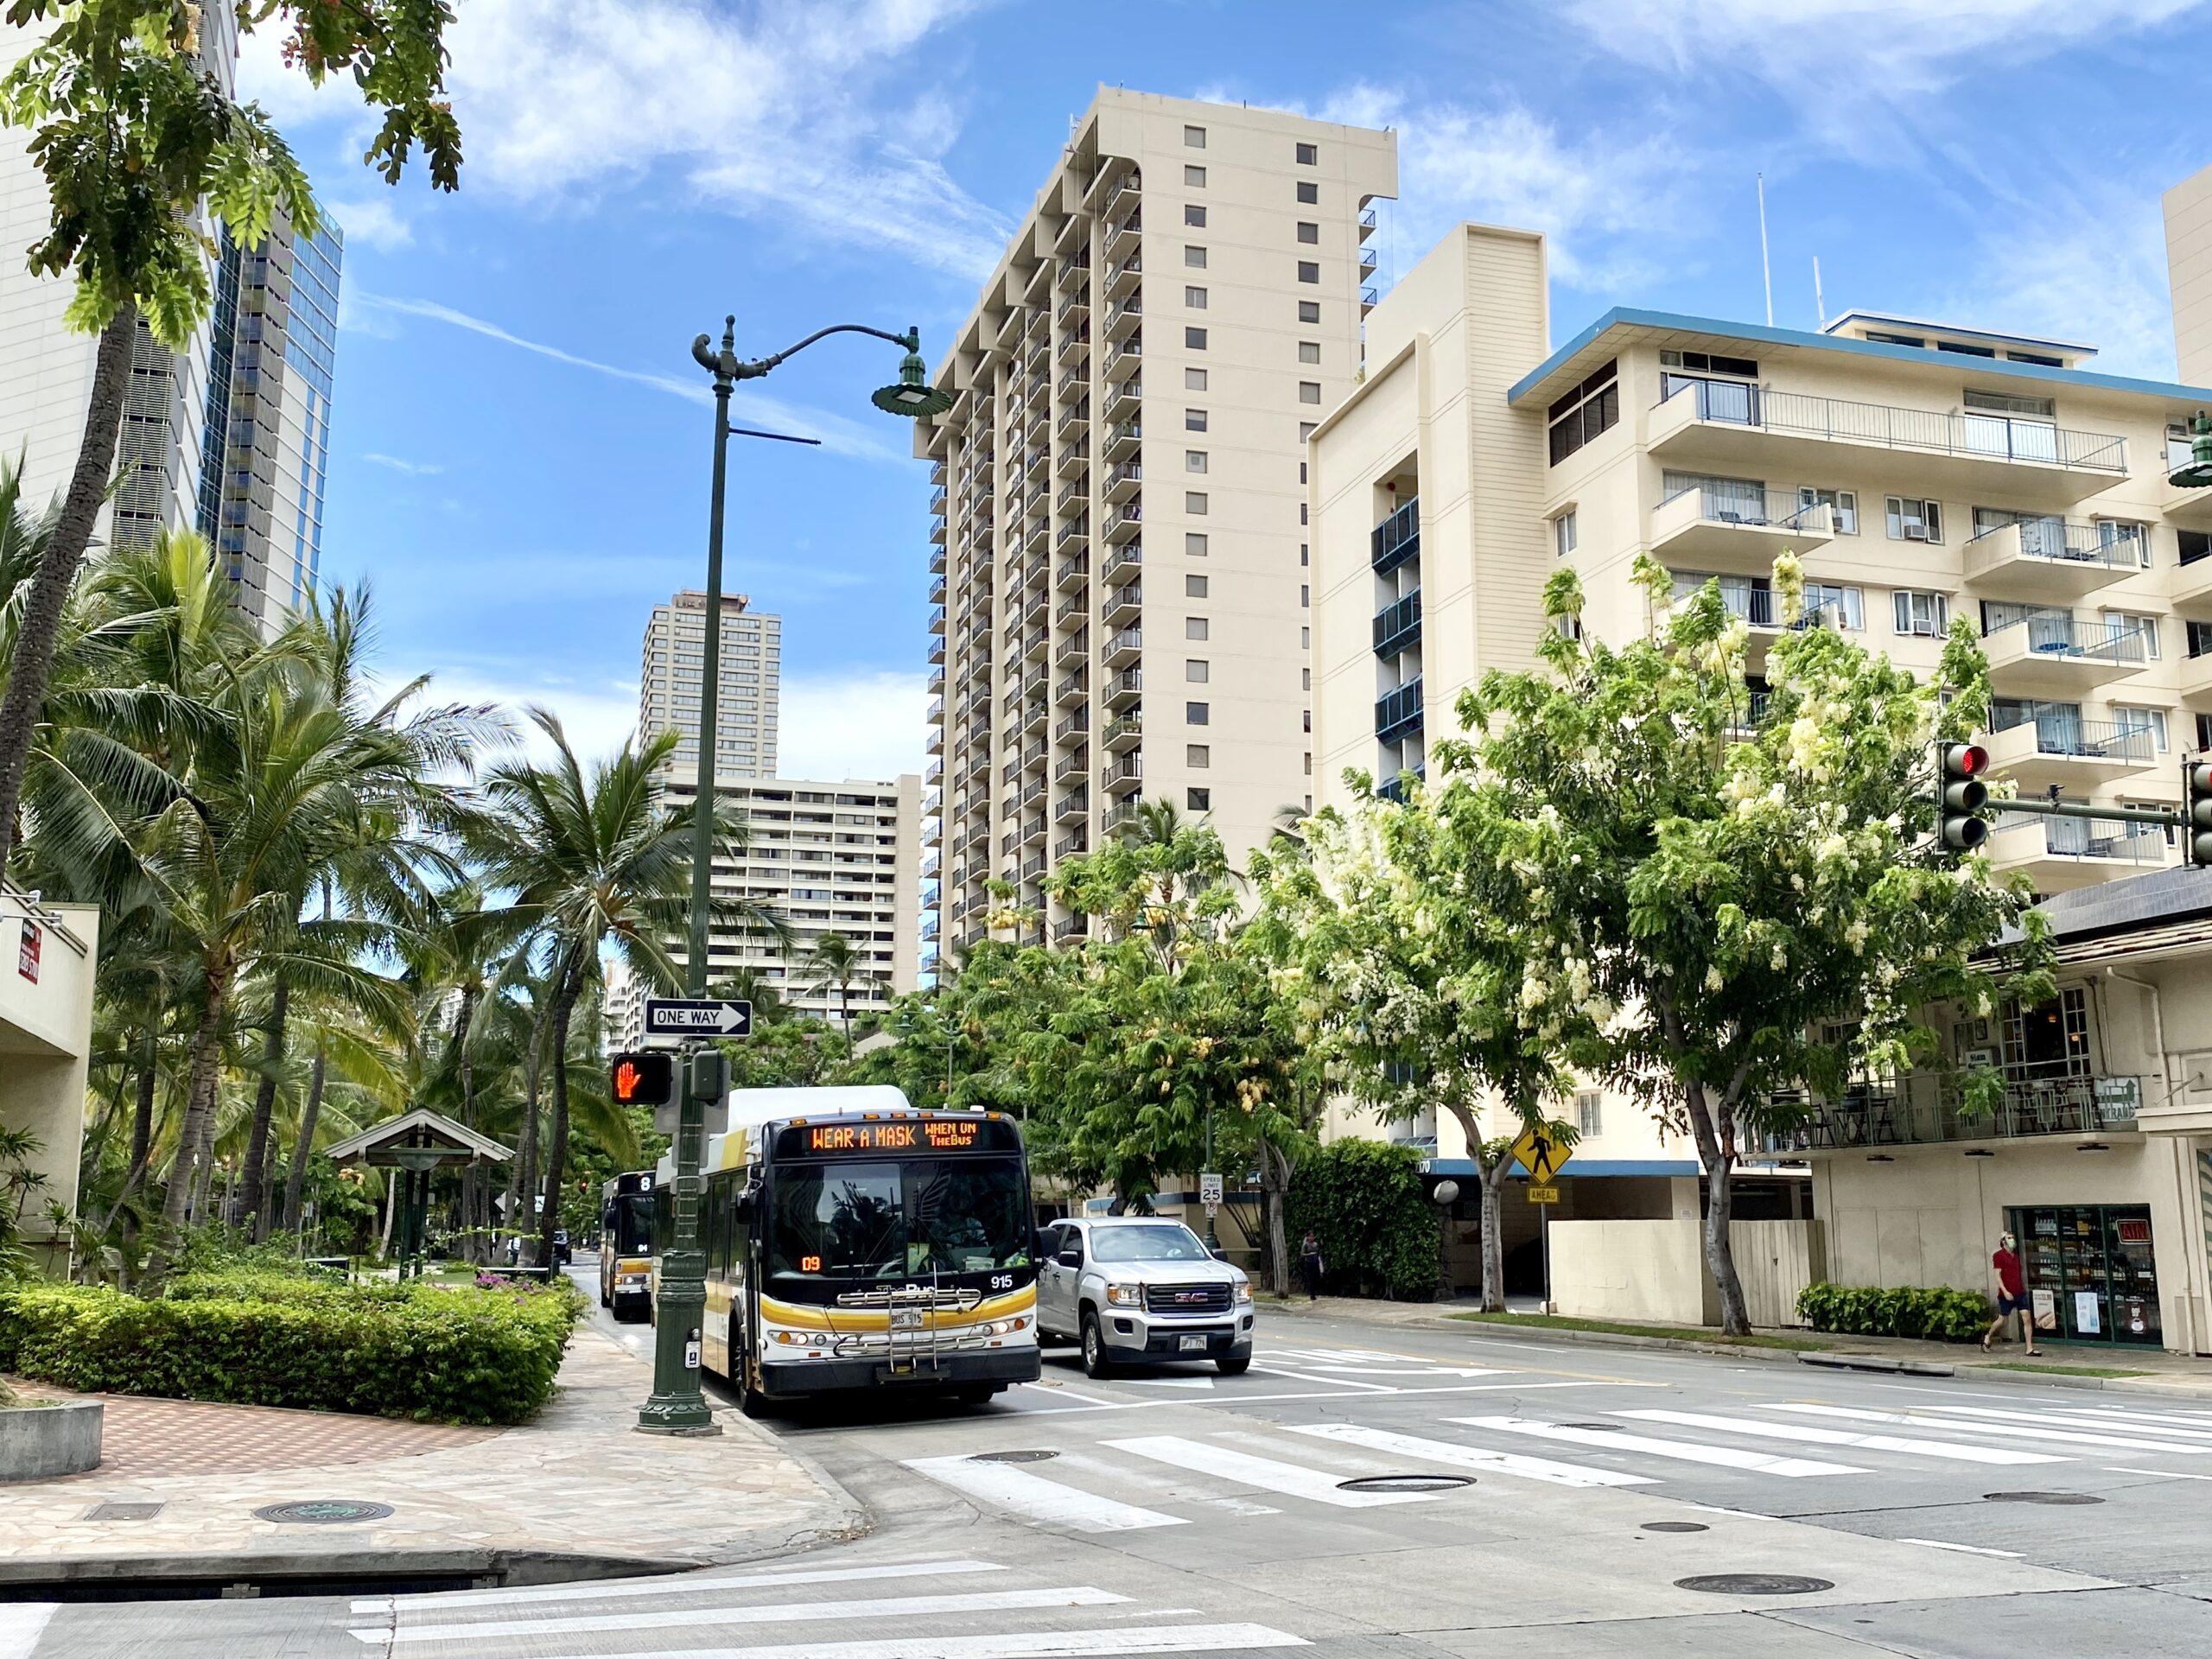 Hawaiian Electric electric bus